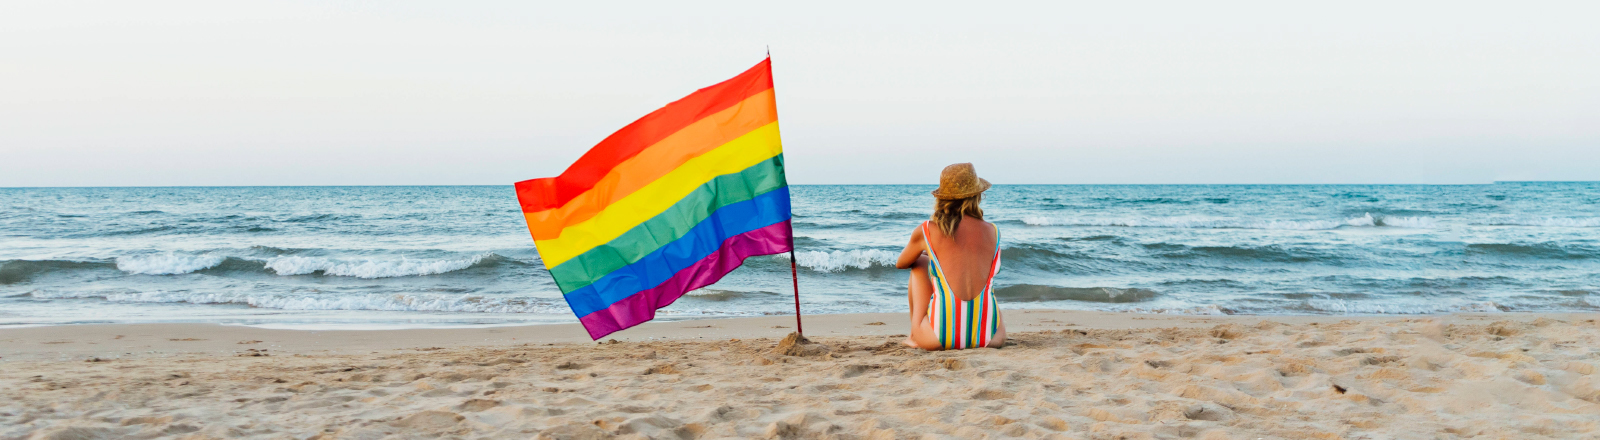 Frau mit Regenbogen-Fahne am Strand